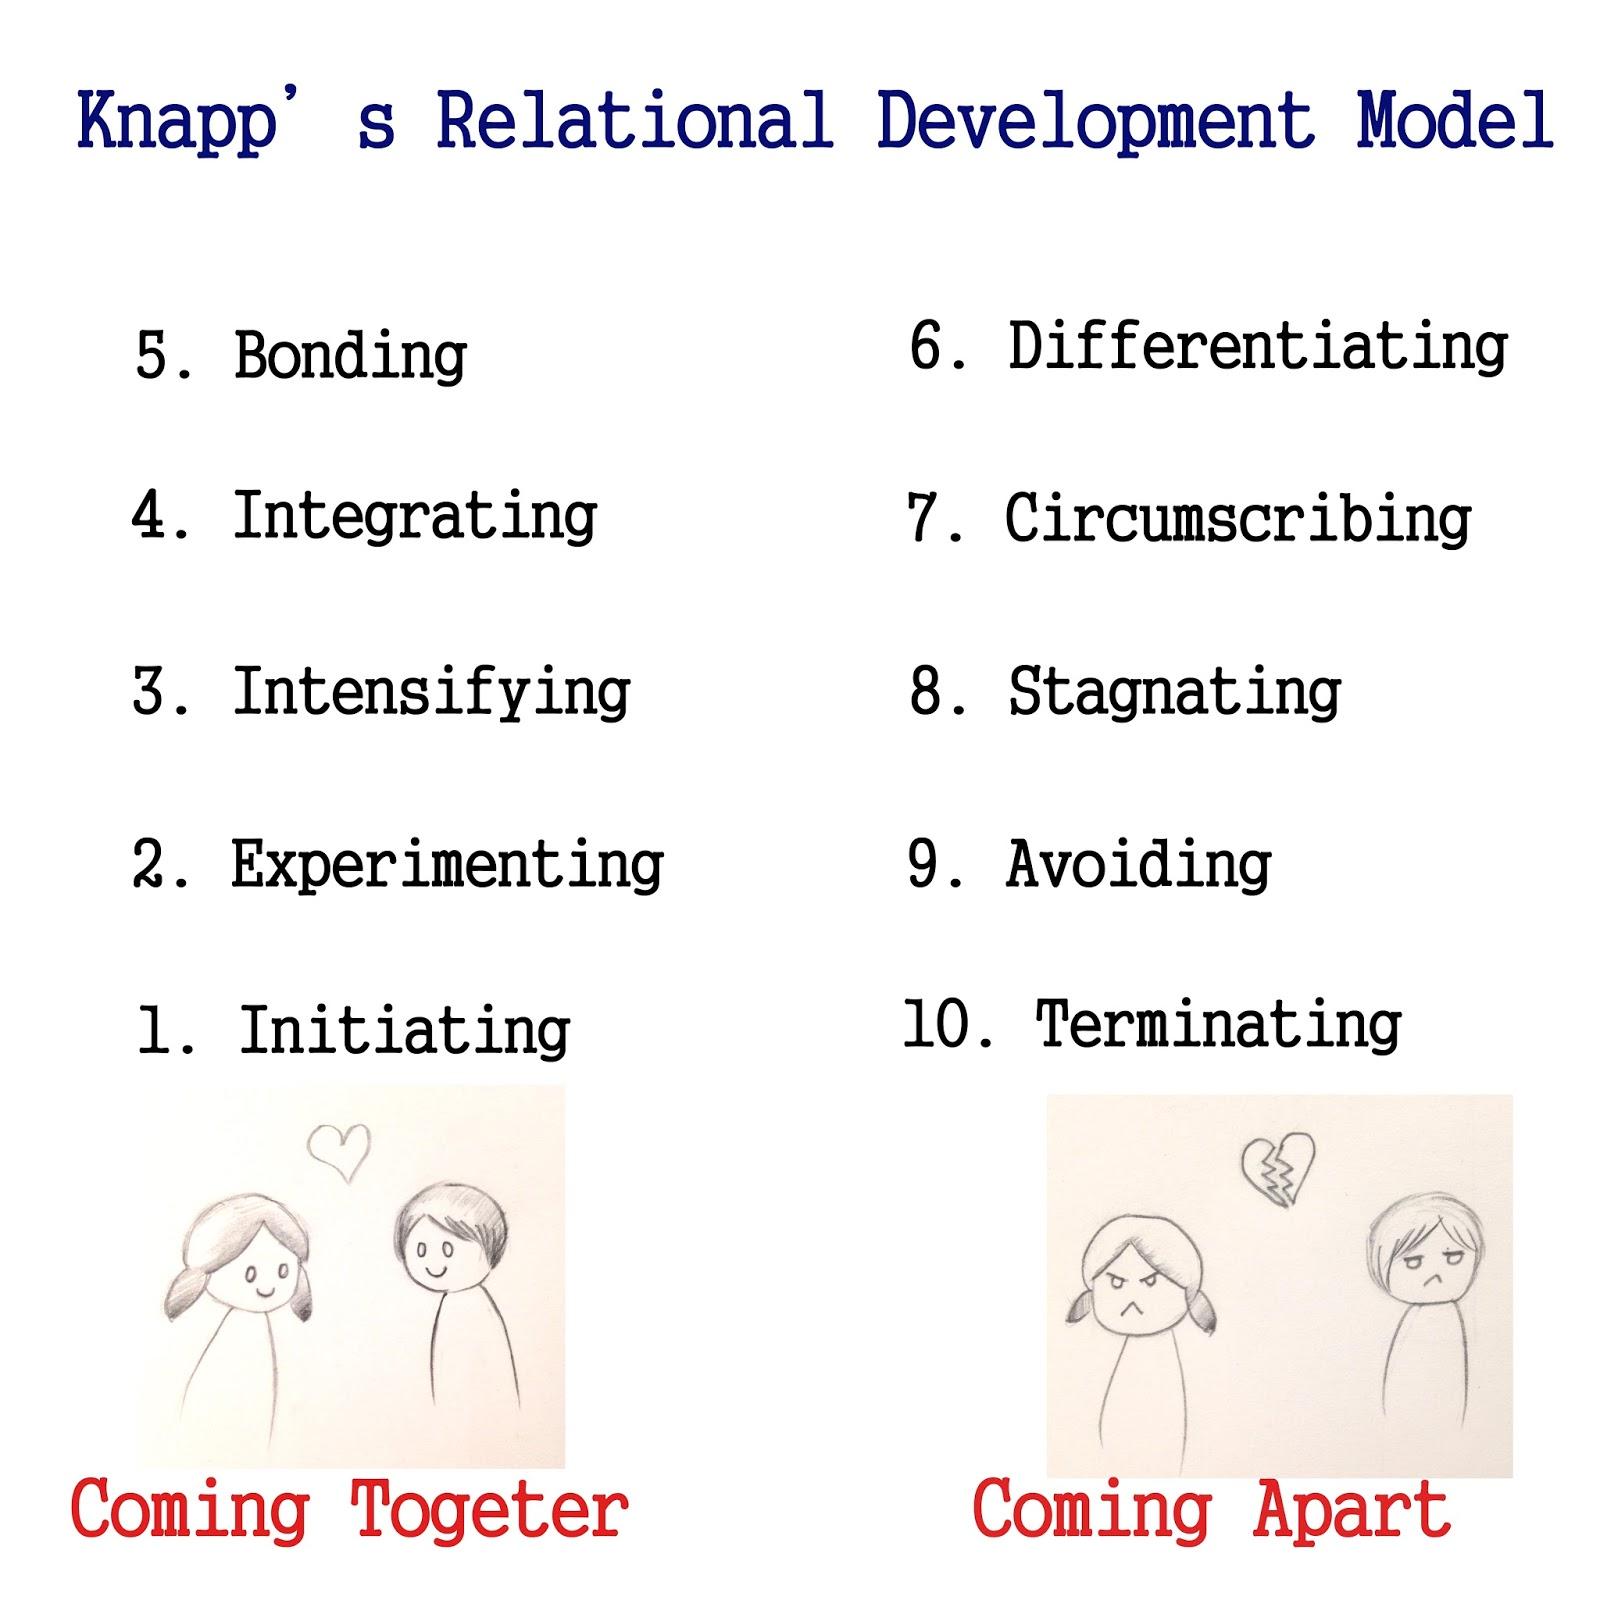 interpersonal relationships intimacy essay Family and intimate relationships deception in interpersonal relationships conflict and power interpersonal communication in business relationships.